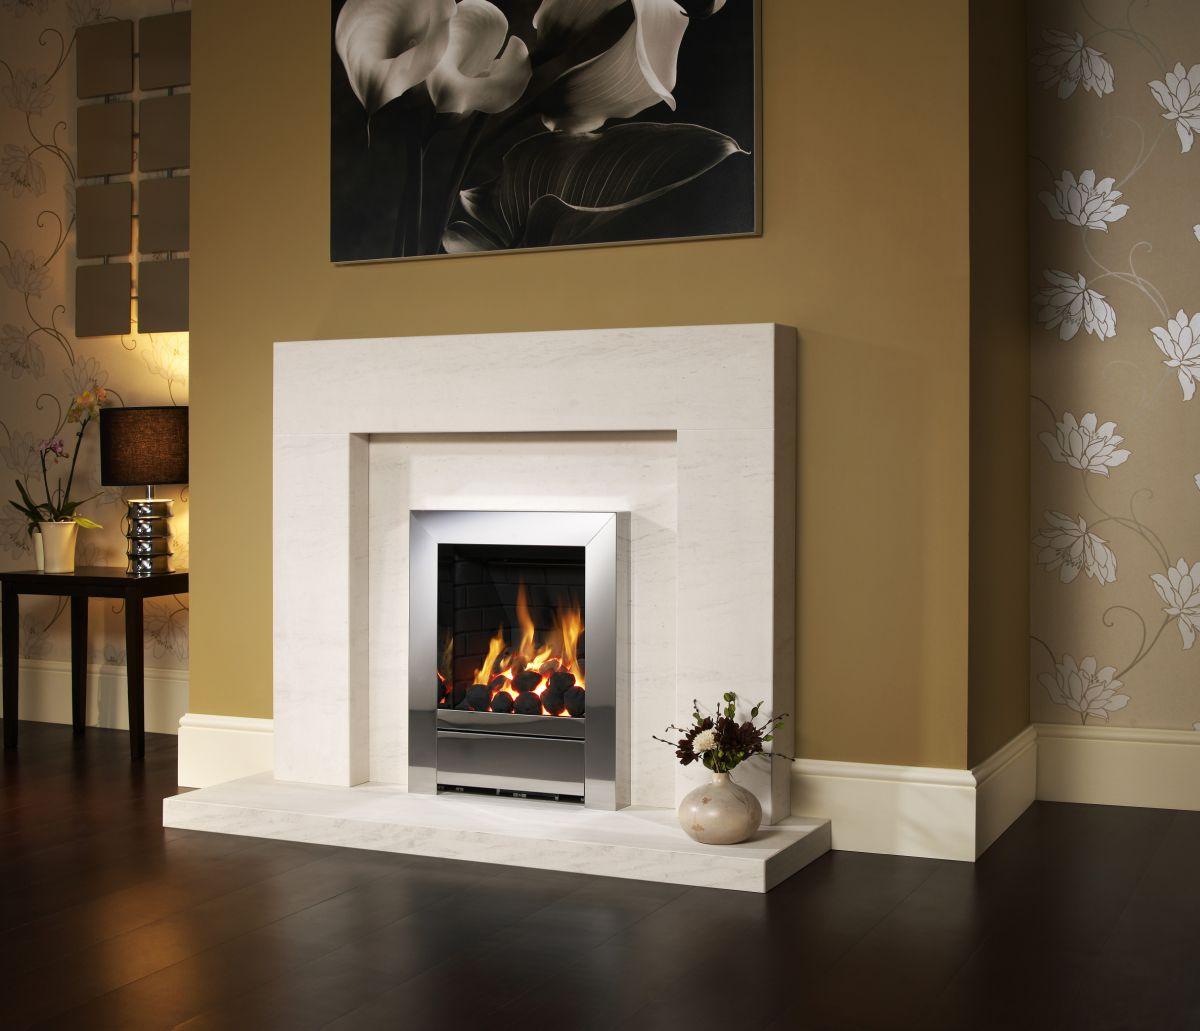 Fullsize Of Fireplace Surround Ideas